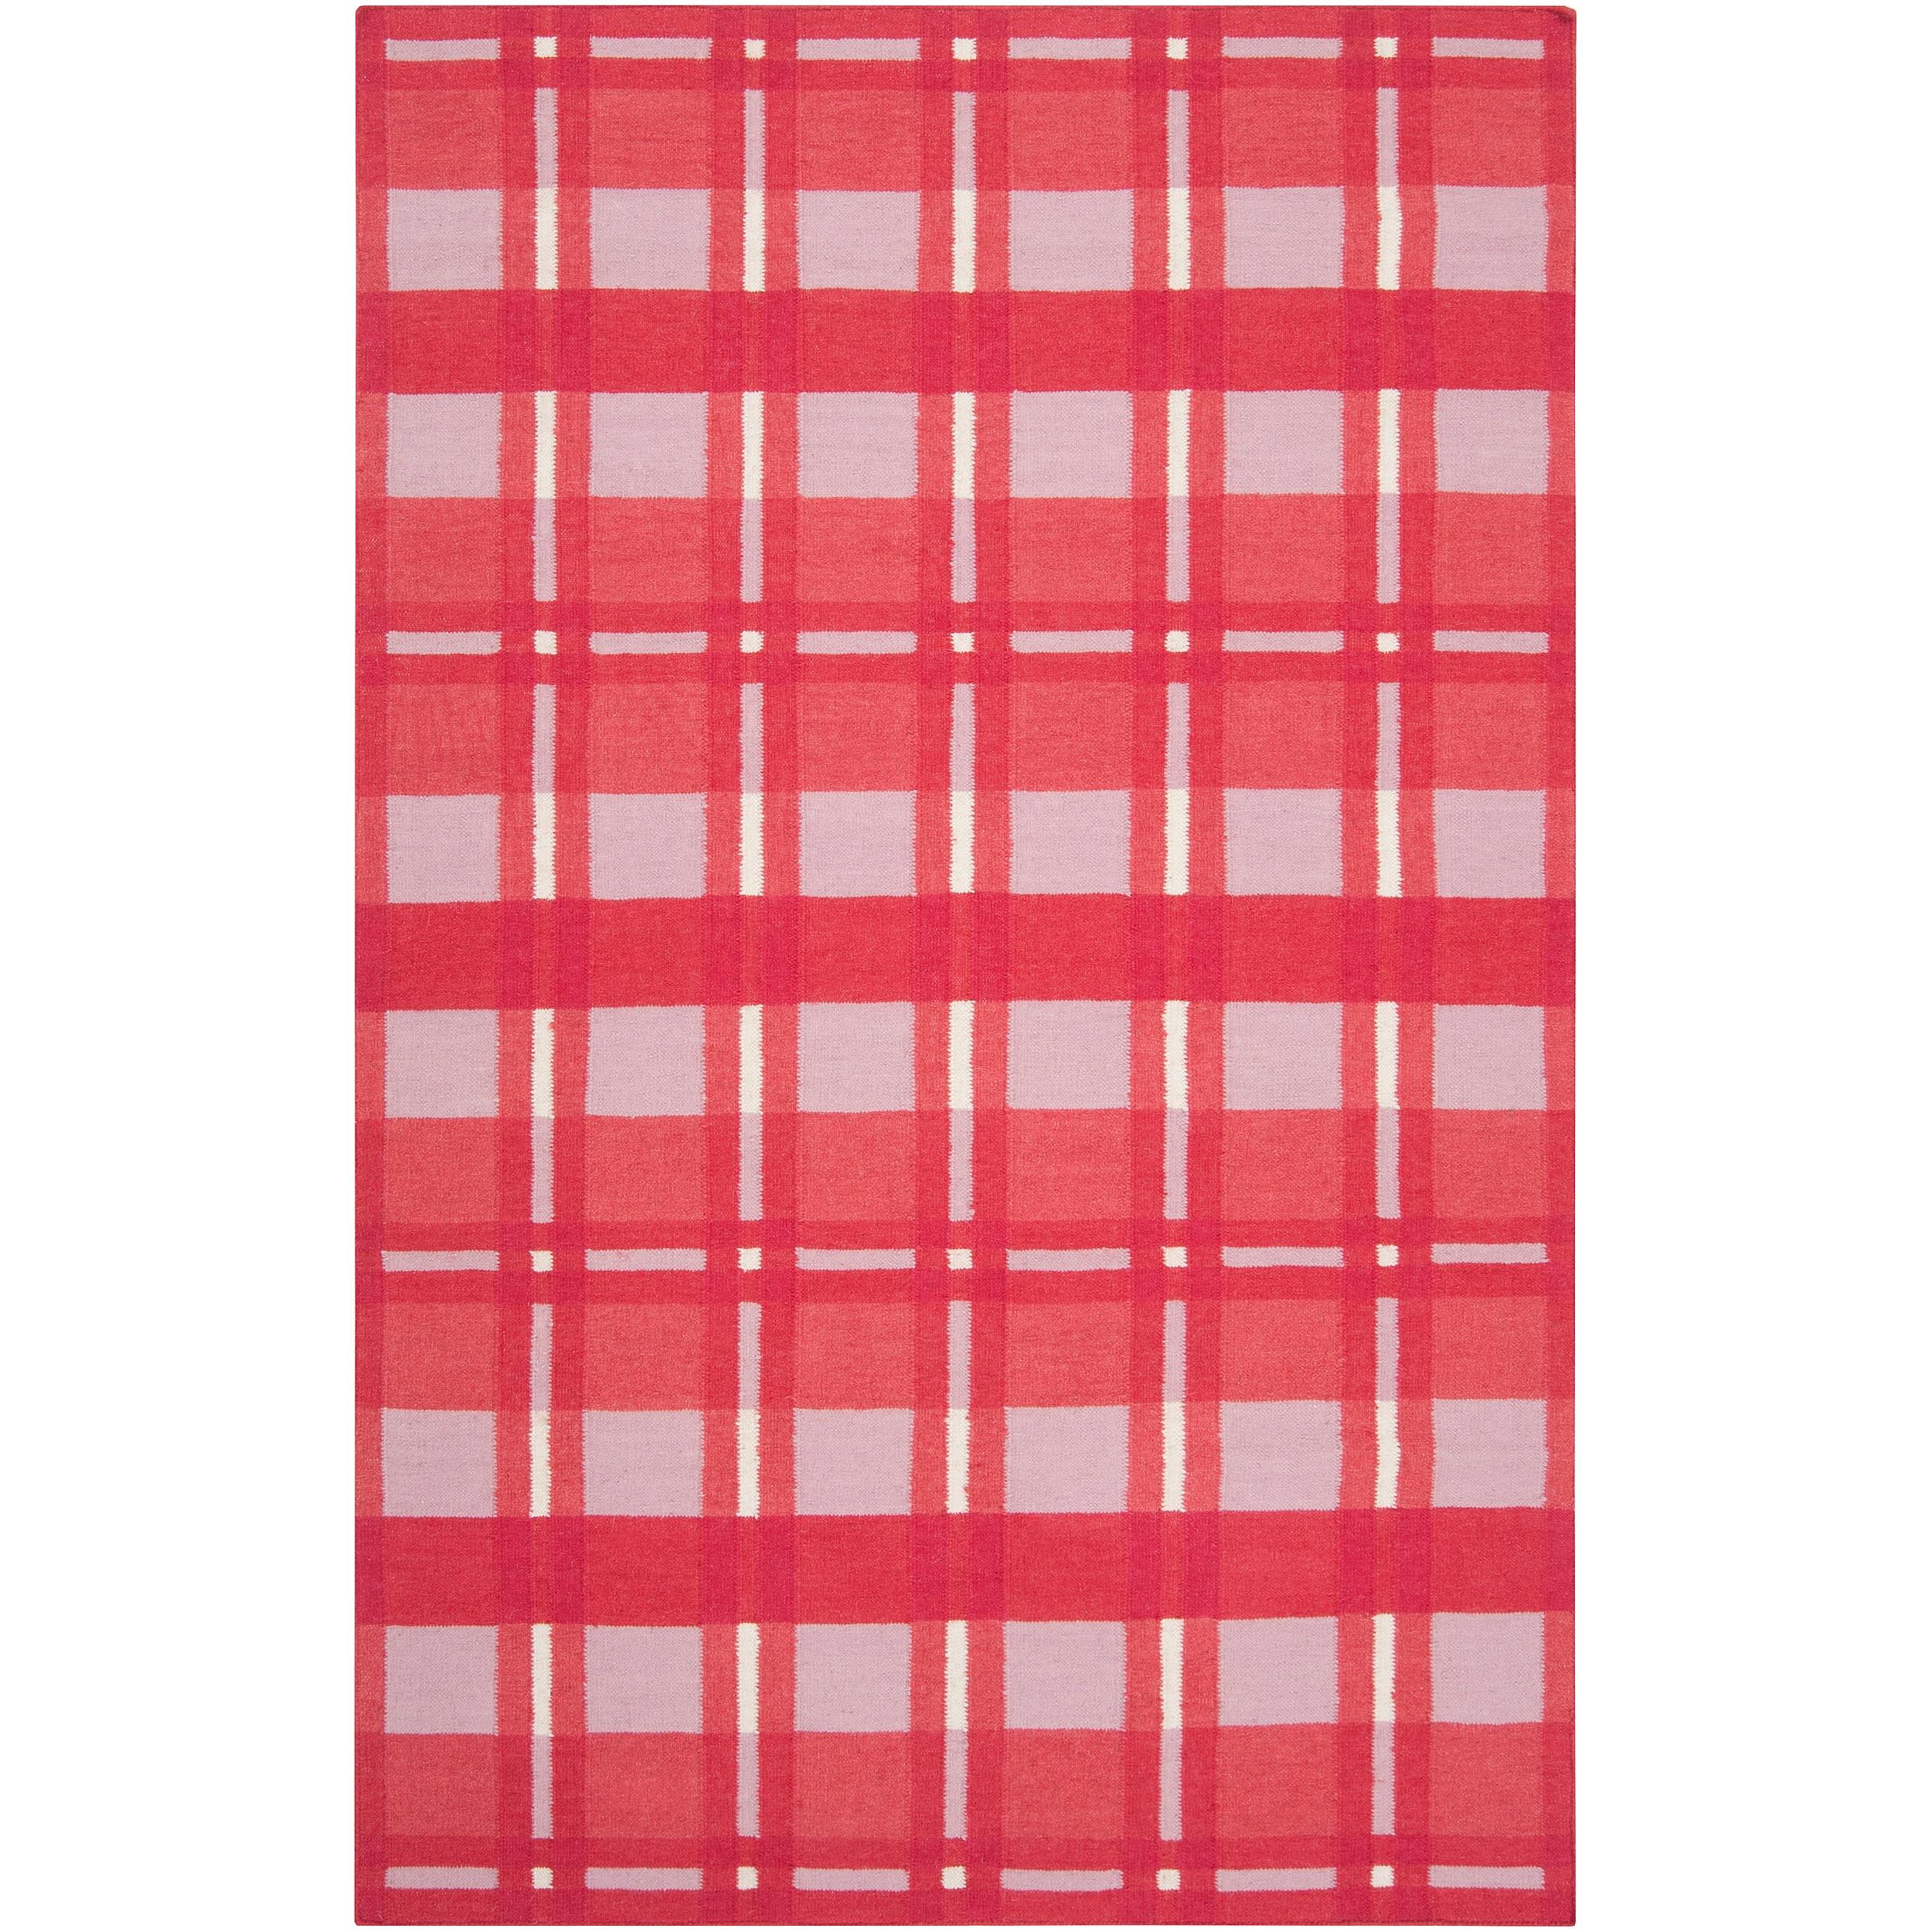 Hand-woven Pink Hapac Wool Area Rug - 5' x 8'